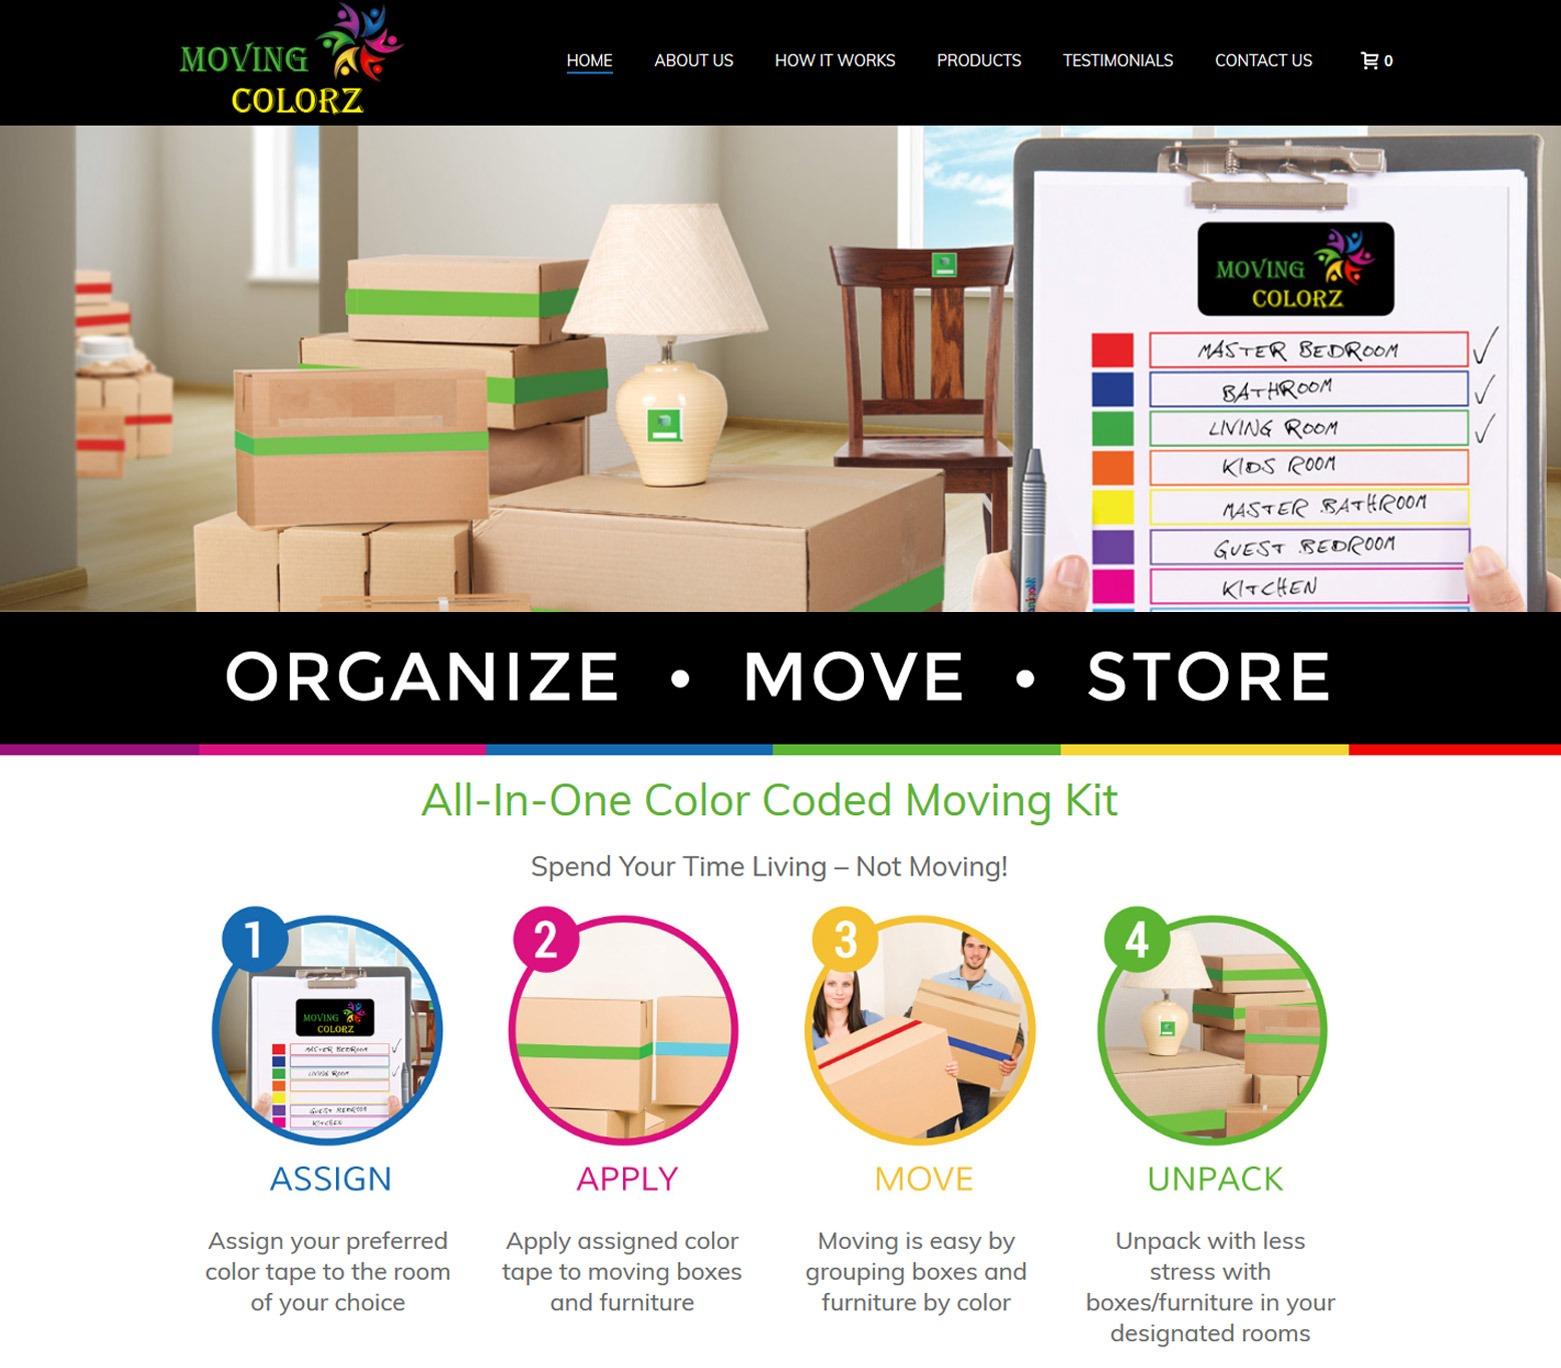 Los Angeles Storage Company Web Design Company